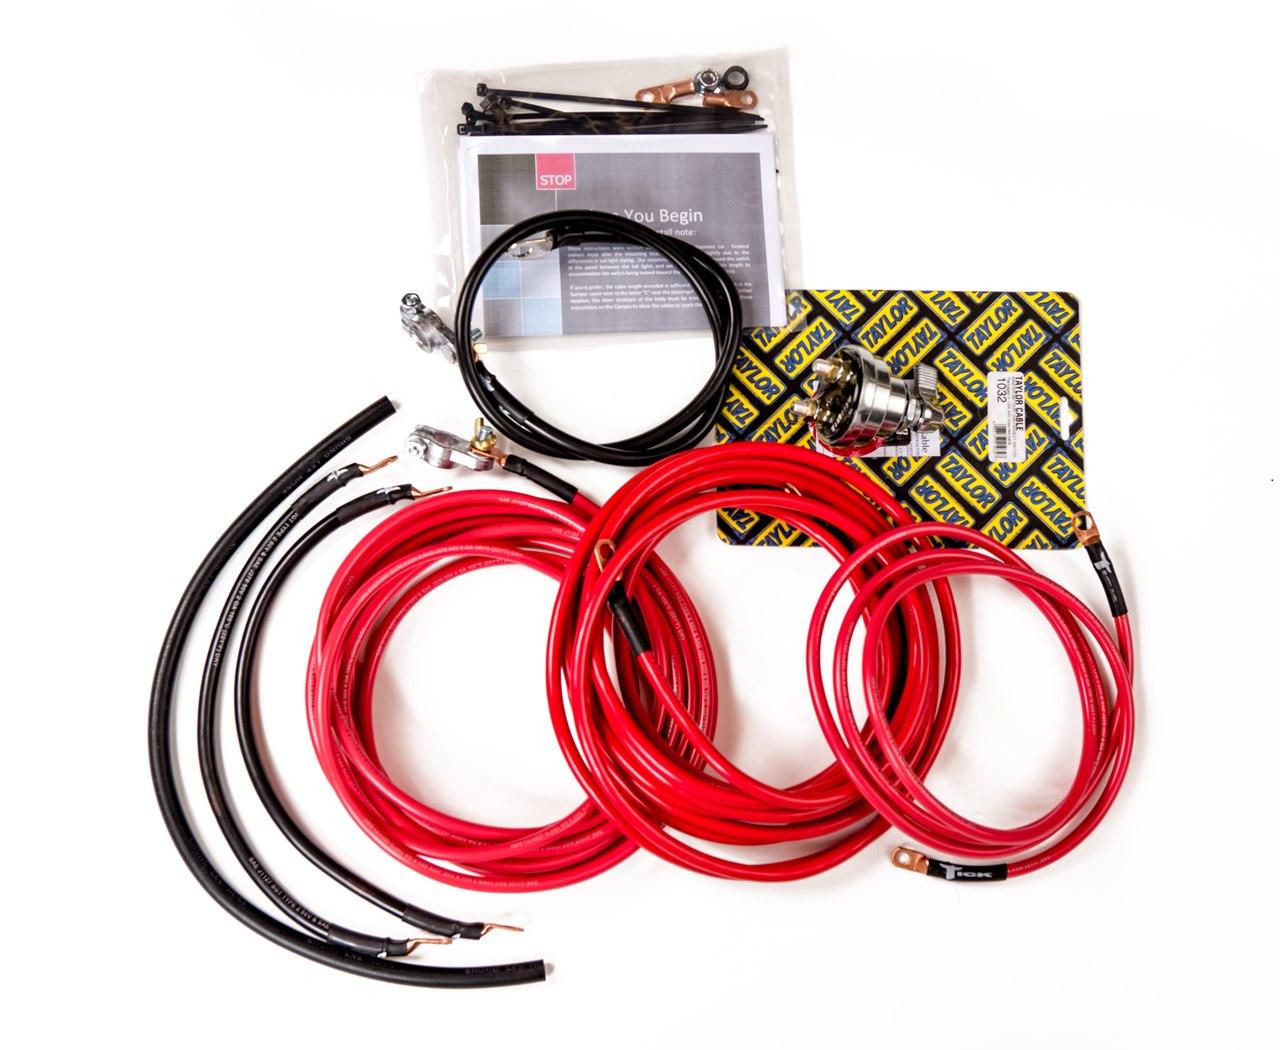 Tick Performance Battery Relocation Kit For 98 02 Camaro Firebird Ls1 Tick Performance Inc